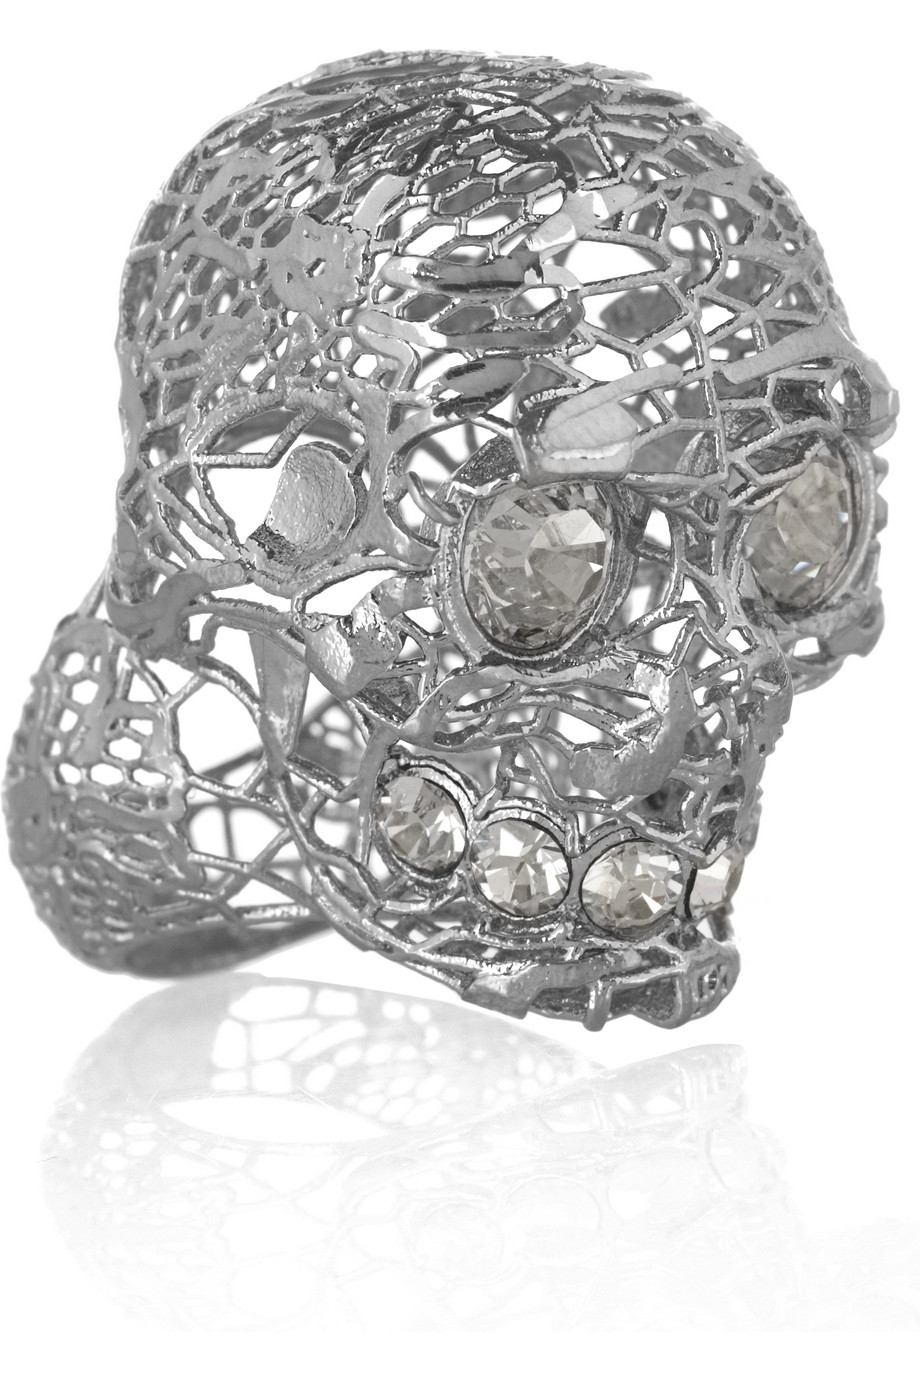 e3878b8d38af4 Alexander McQueen Silver Plated Swarovski Crystal Skull Ring in ...